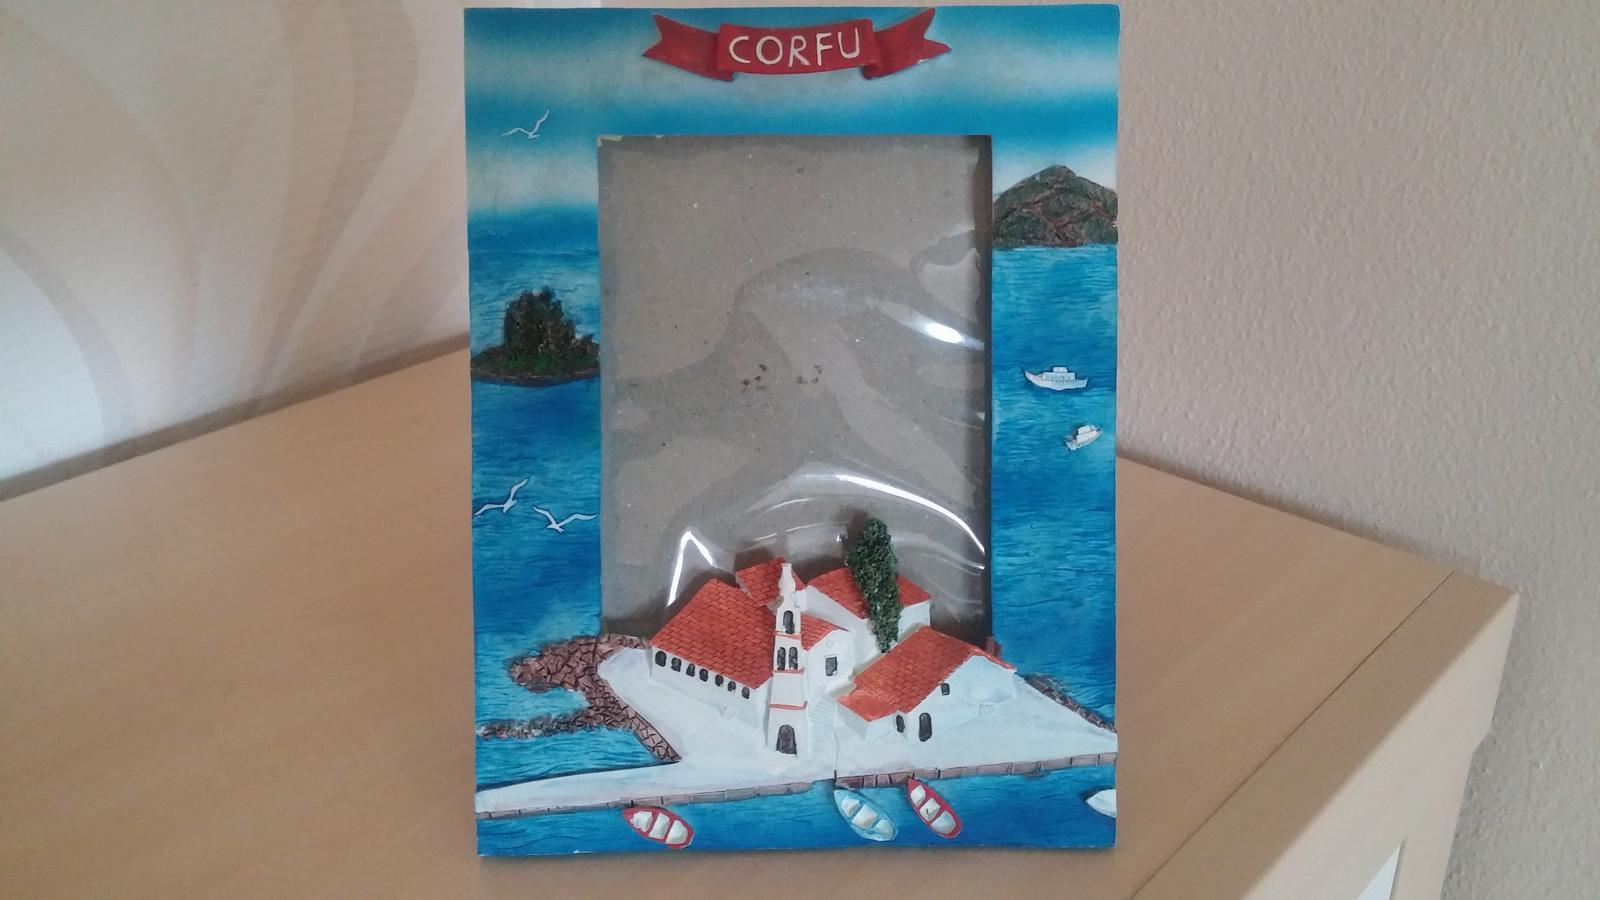 Fotoramik Corfu - Obrázok č. 1